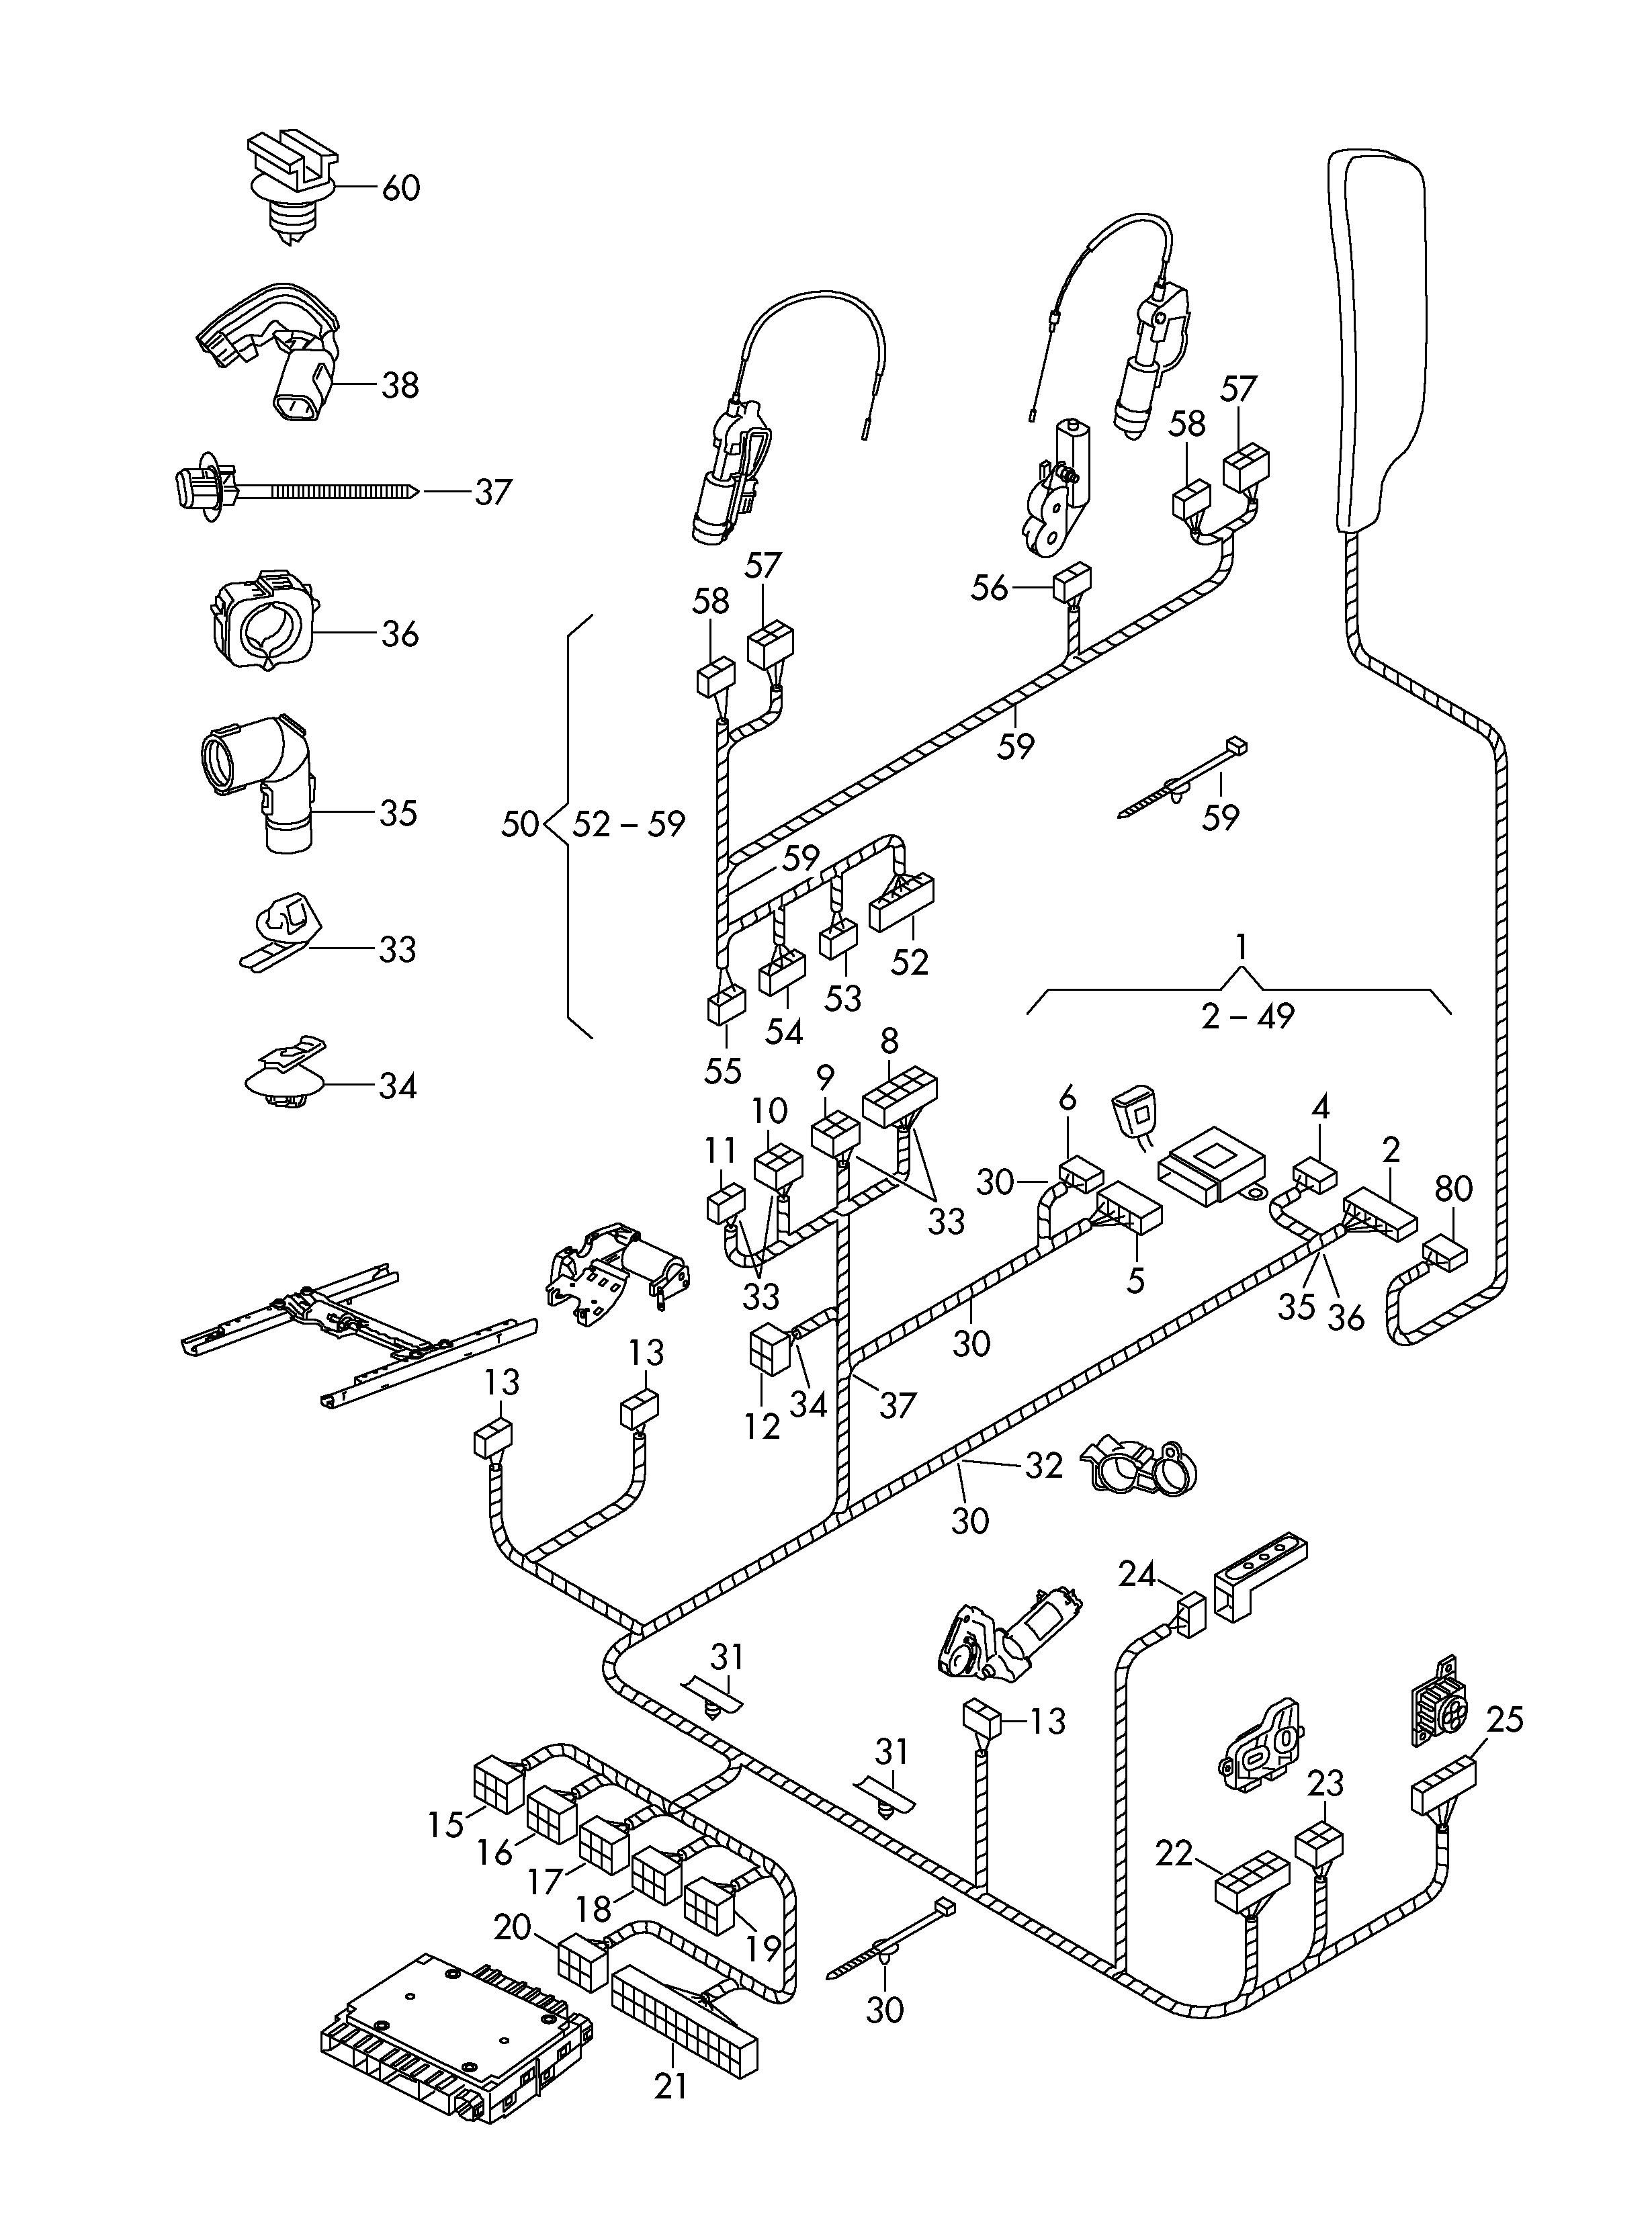 Octavia 2 Wiring Diagram